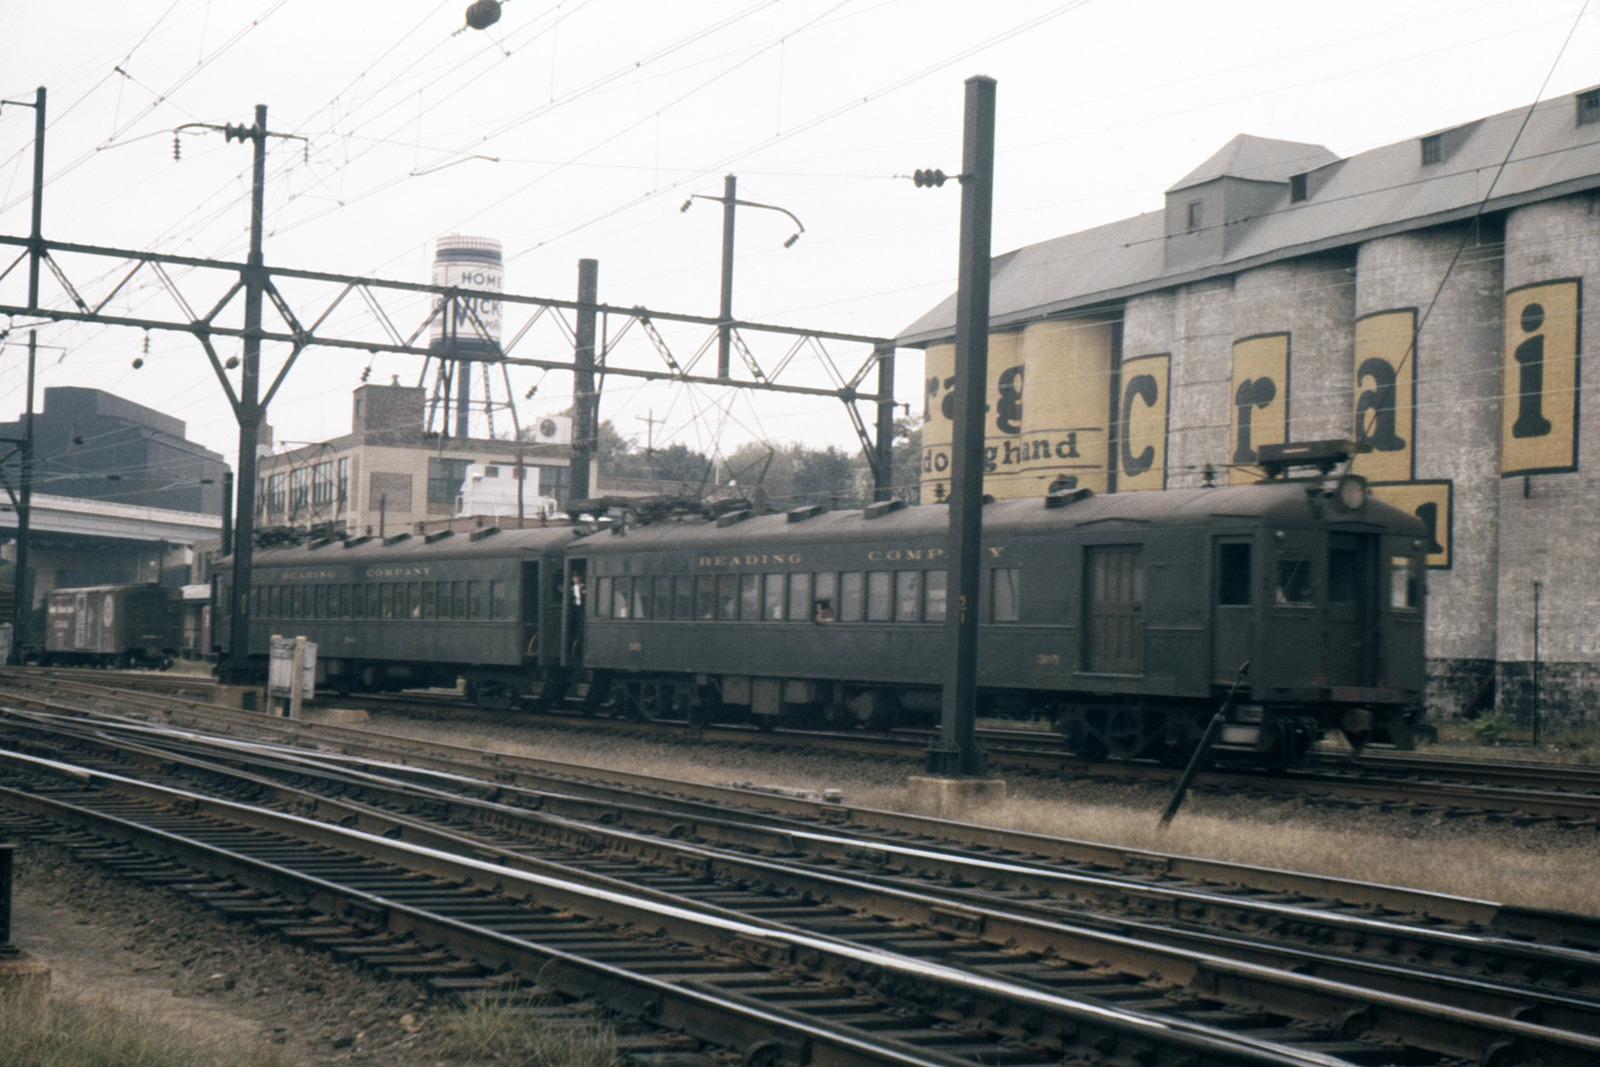 (500k, 1600x1067)<br><b>Country:</b> United States<br><b>City:</b> Philadelphia, PA<br><b>System:</b> SEPTA Regional Rail<br><b>Line:</b> SEPTA Regional Rail-Center City<br><b>Location:</b> Wayne Jct.<br><b>Car:</b> SEPTA Blueliner (Ex-RDG) (1931) 305 <br><b>Photo by:</b> Ed Davis, Sr.<br><b>Collection of:</b> David Pirmann<br><b>Date:</b> 9/1960<br><b>Viewed (this week/total):</b> 0 / 3991